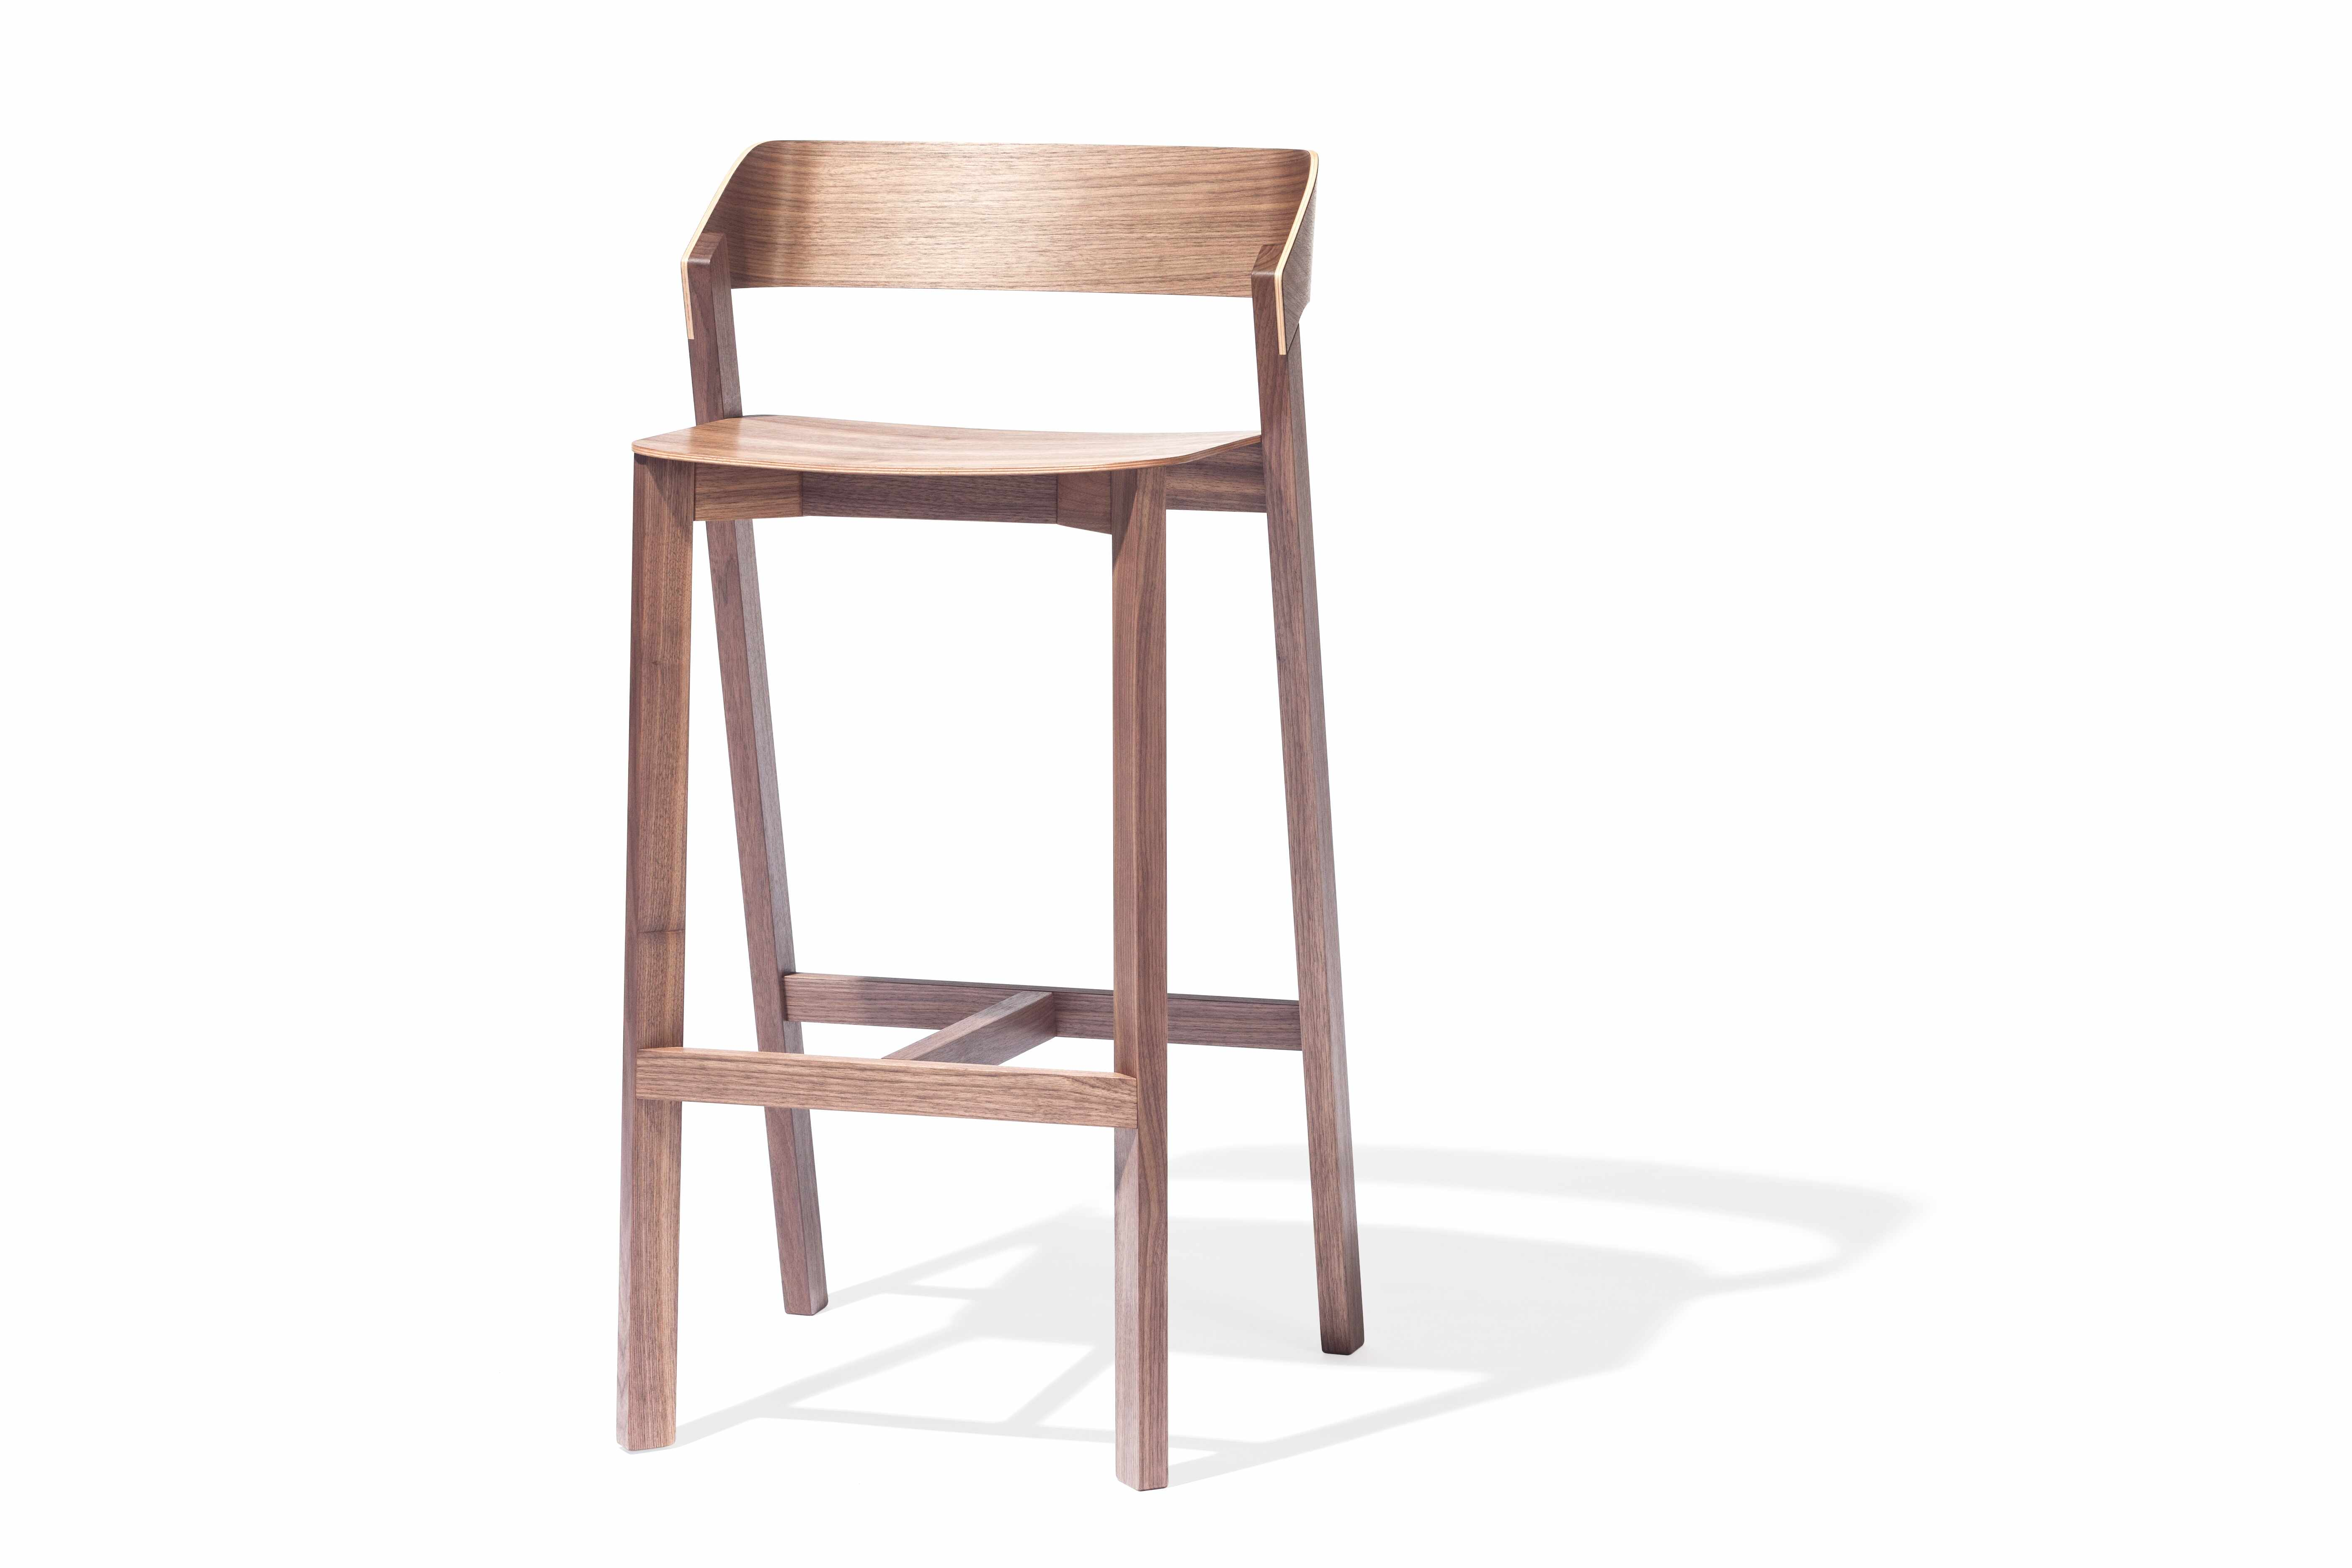 Scaun de bar din lemn de nuc Merano High Walnut, l44xA36xH99 cm la pret 6500 lei